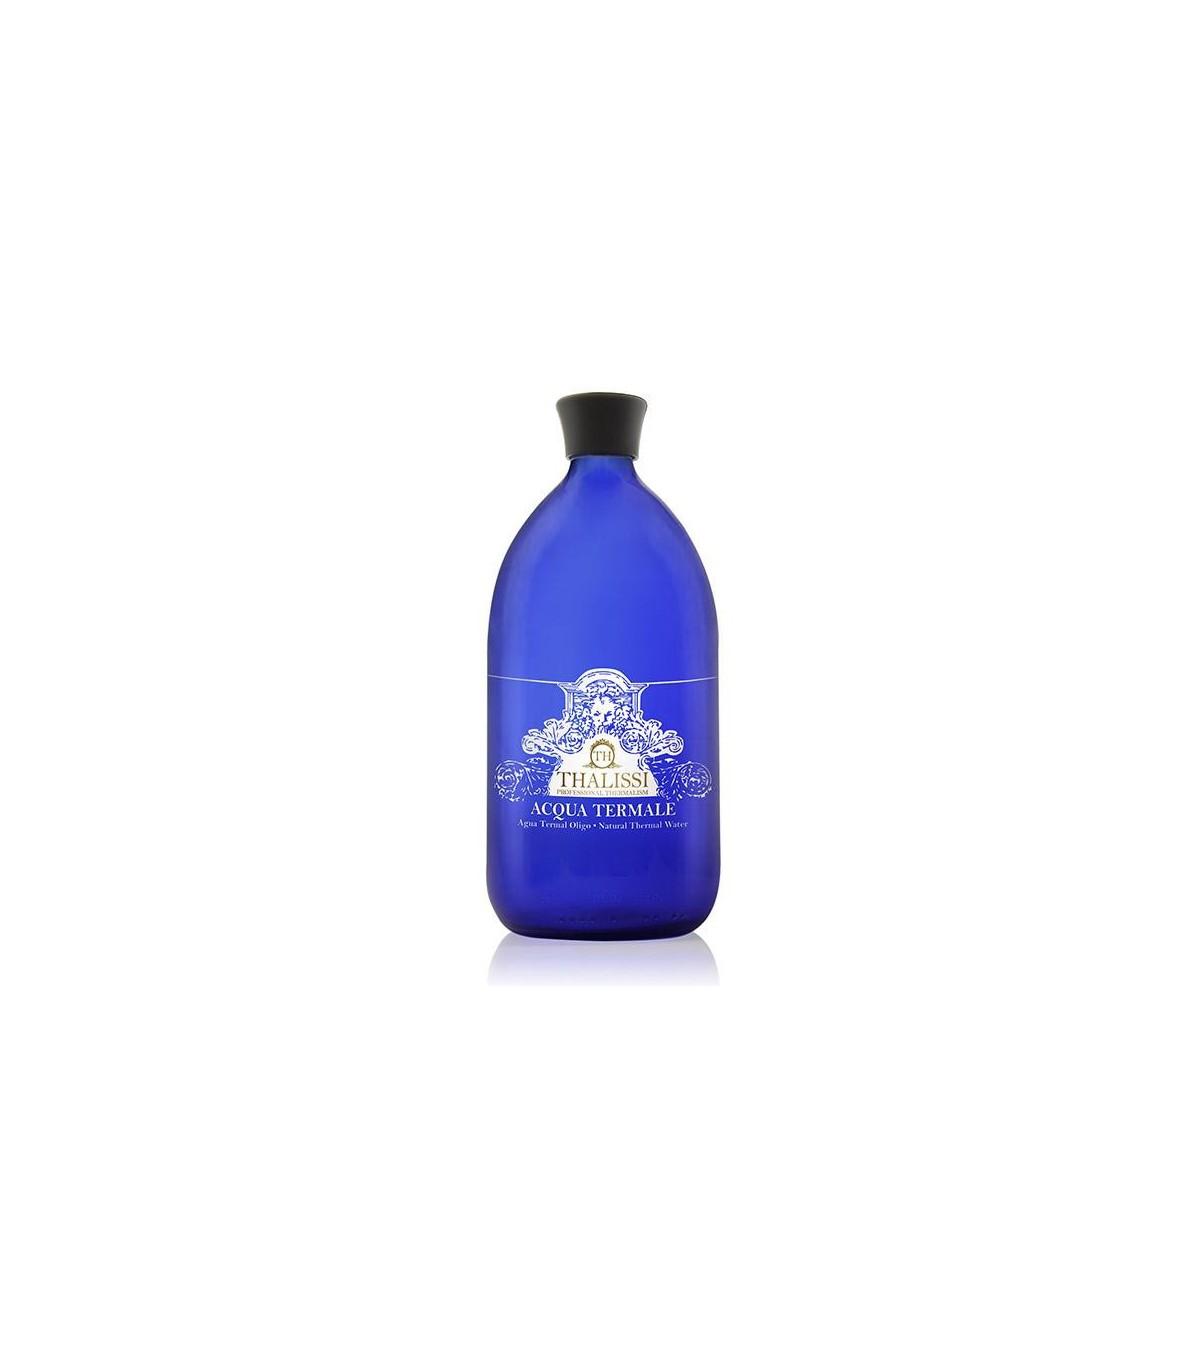 ACQUA TERMALE Agua Termal. 1000 ml